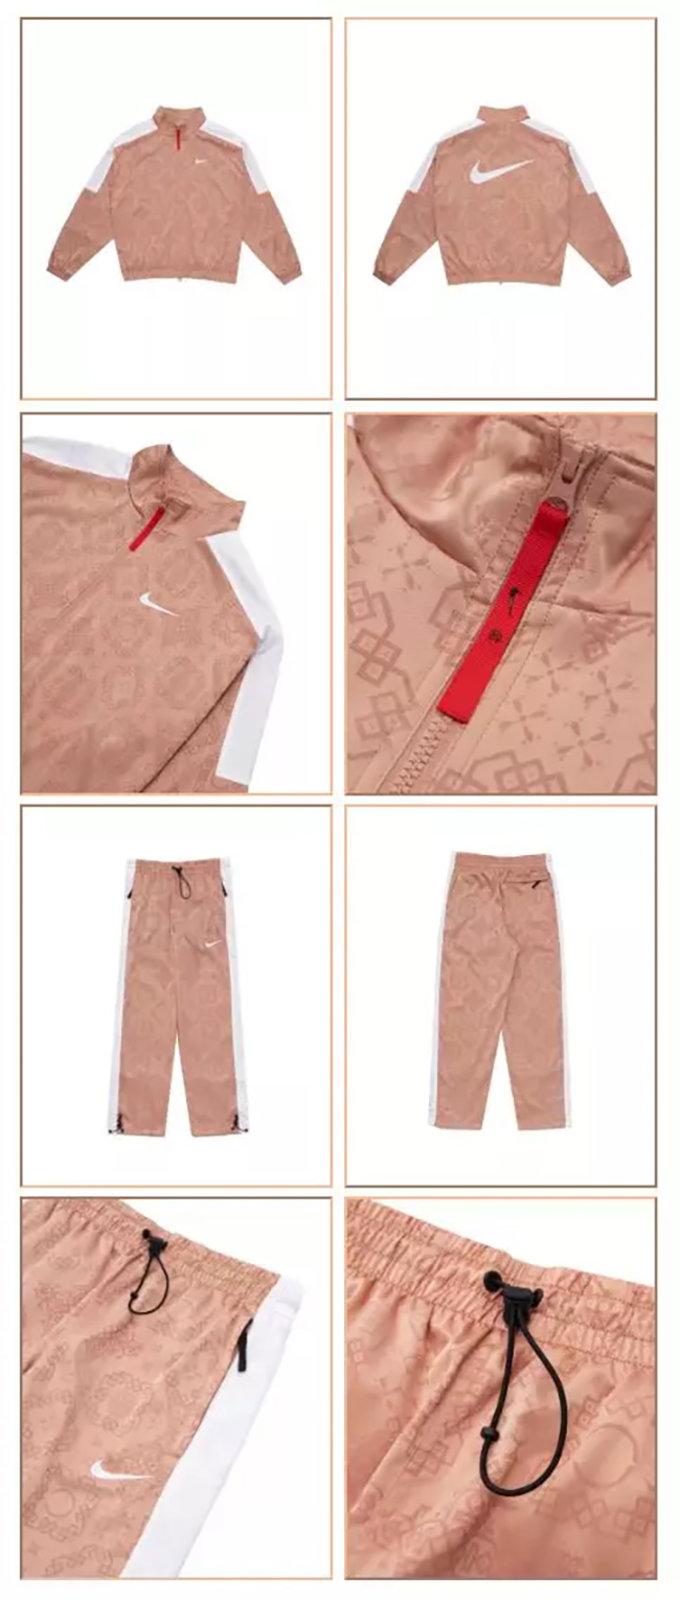 CLOT,AF1,Air Force 1,明星,上脚 距发售一周倒计时!玫瑰金丝绸 CLOT x AF1 官方预告来了!